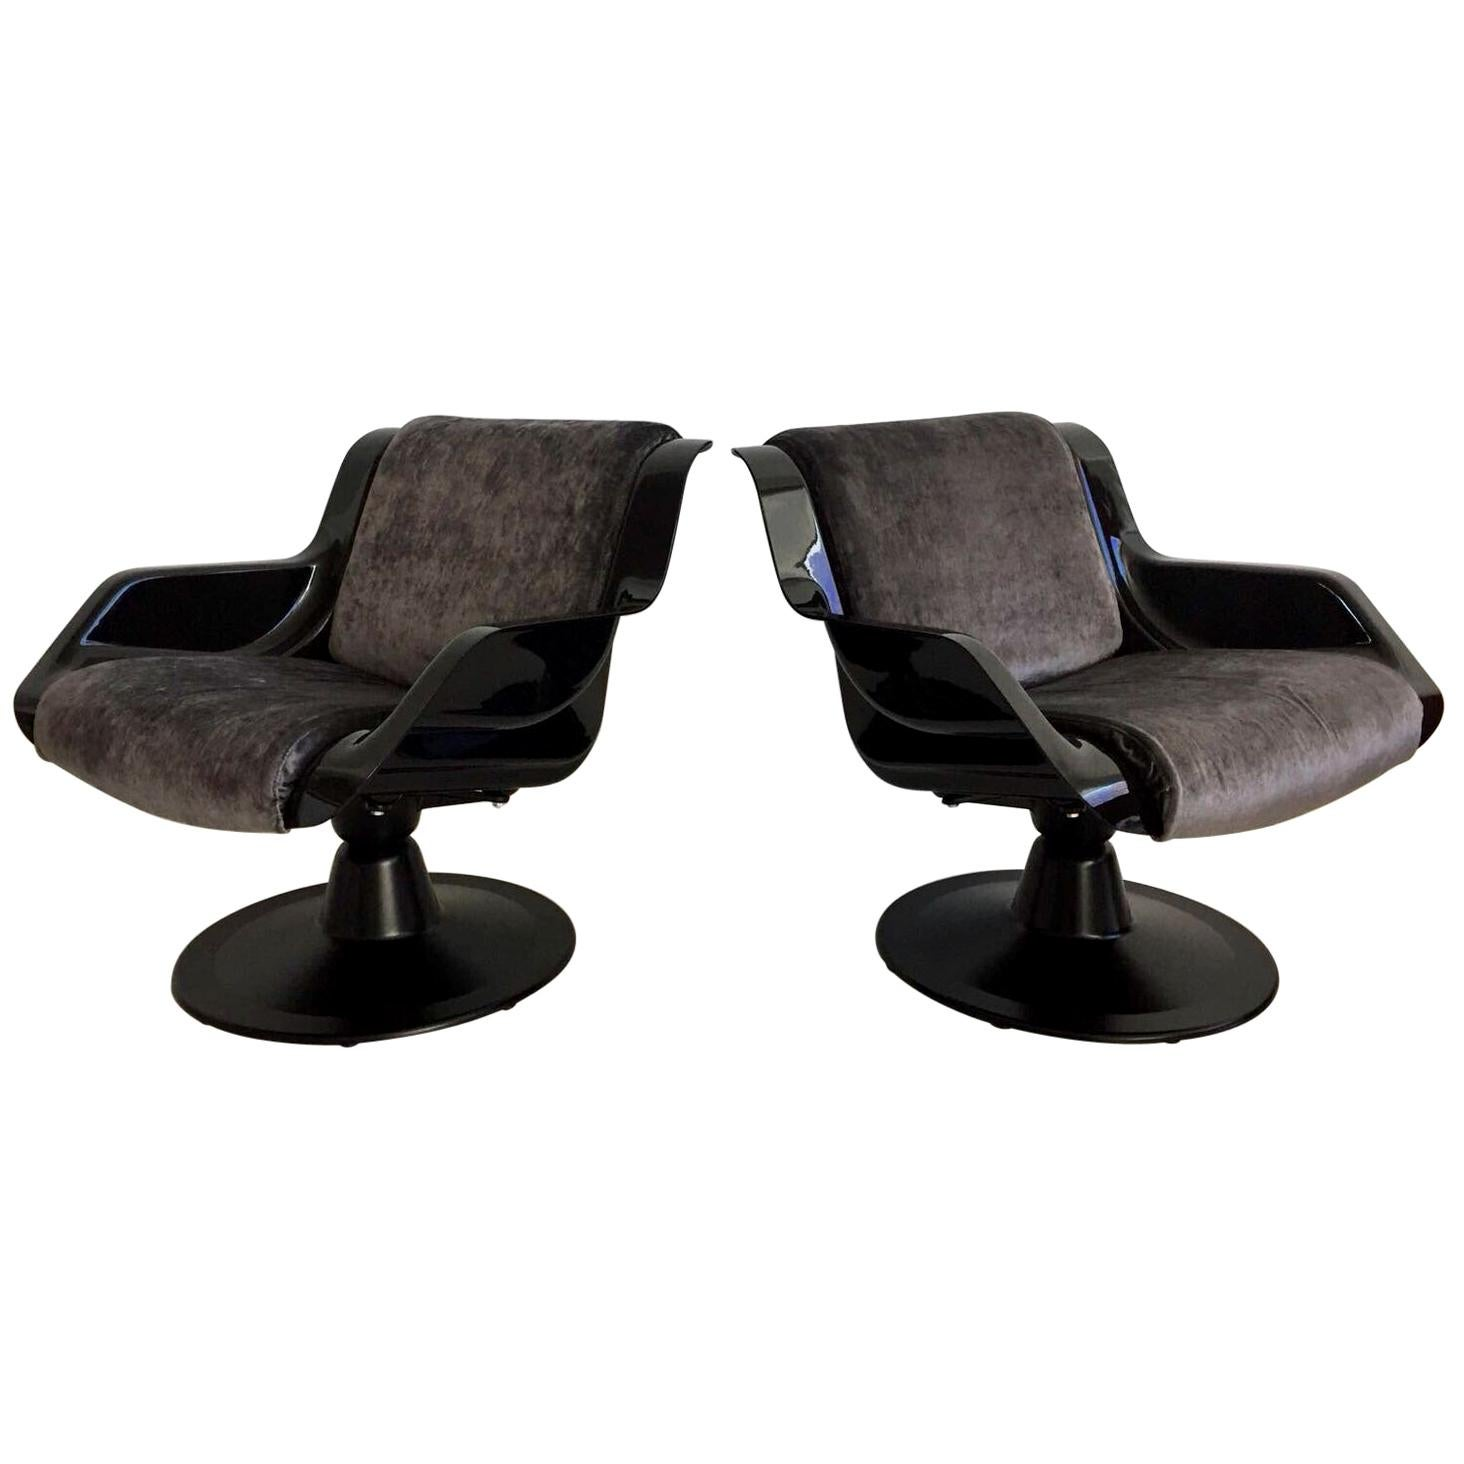 1960 Yrjo Kukkapuro Swivel Lounge Chairs, Model 3814-1KF Dark Grey Velvet